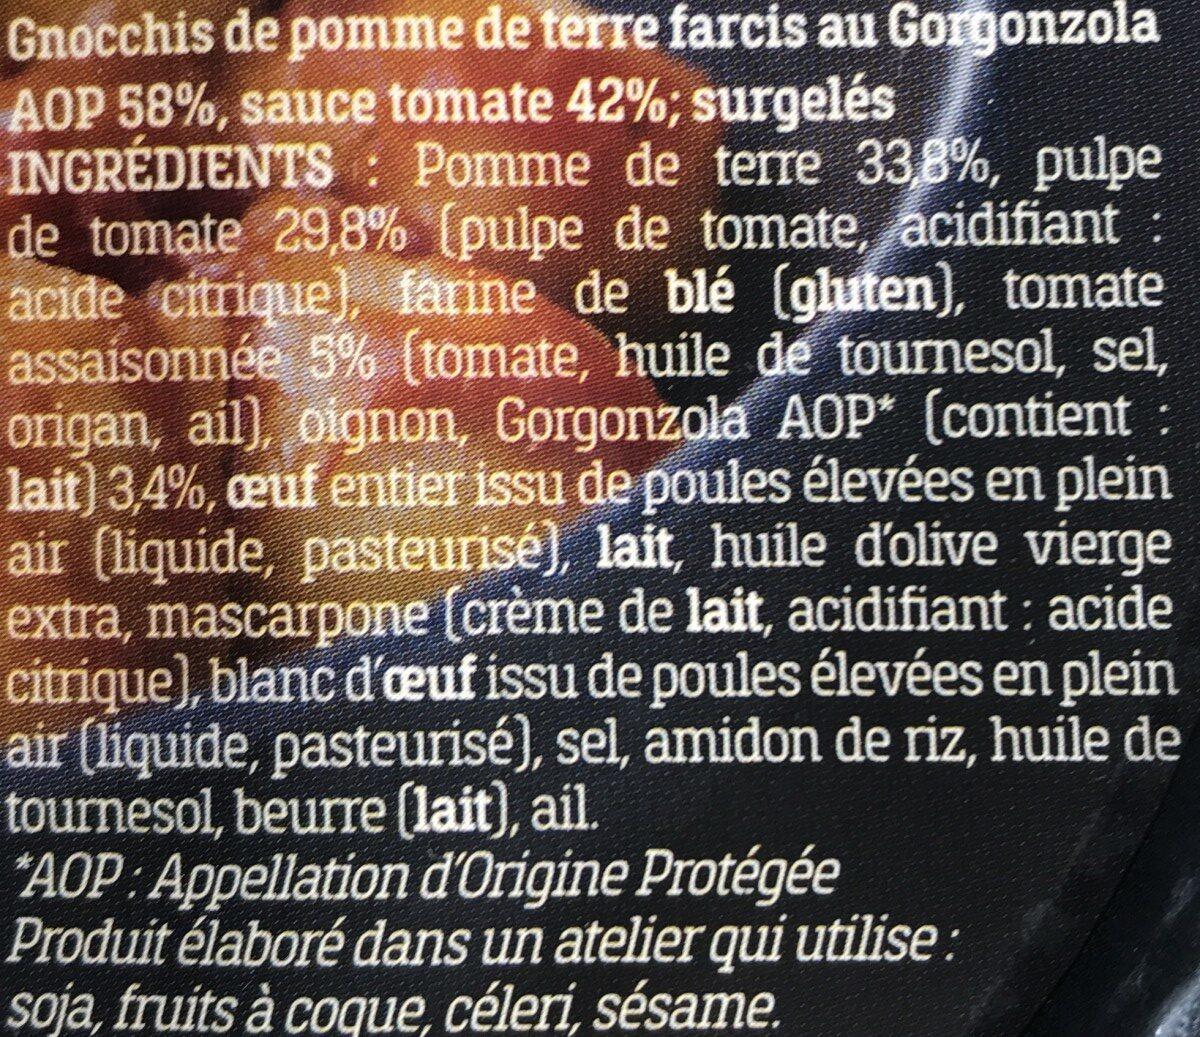 Gnocchi Farcis au Gorgonzola AOP et sauce Tomate - Ingredienti - fr